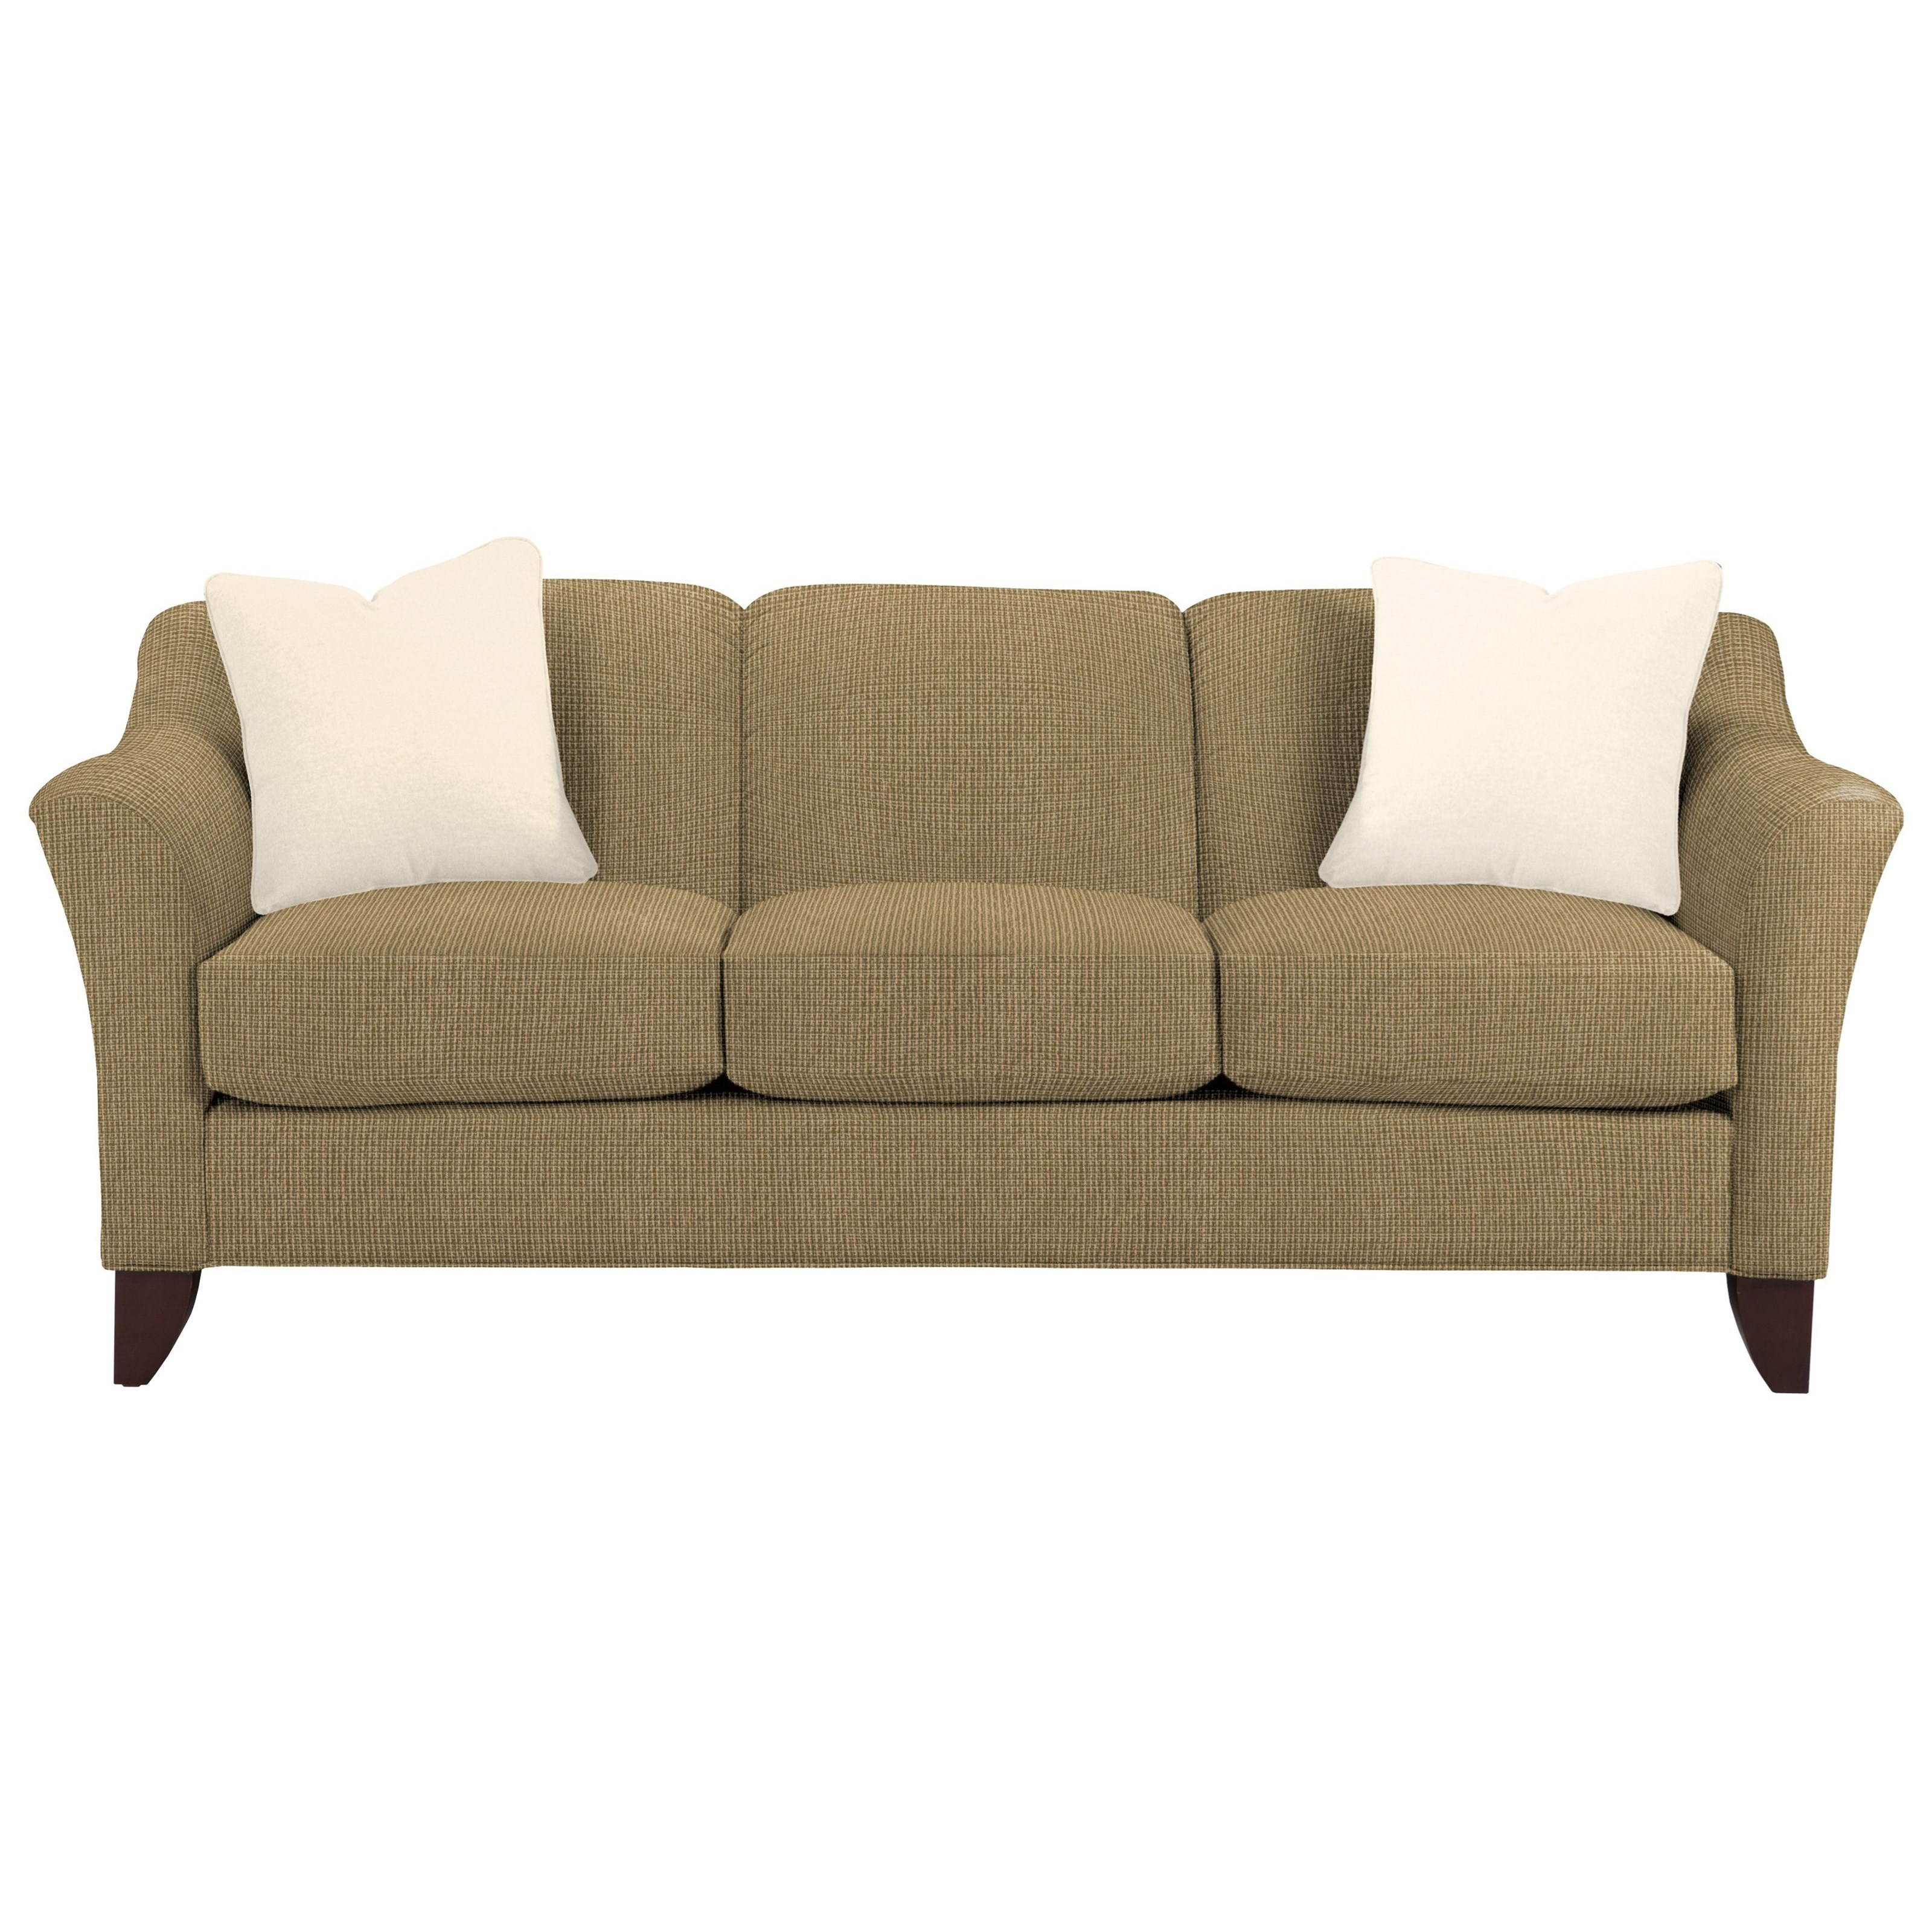 7844 Stationary Sofa by Hickorycraft at Johnny Janosik